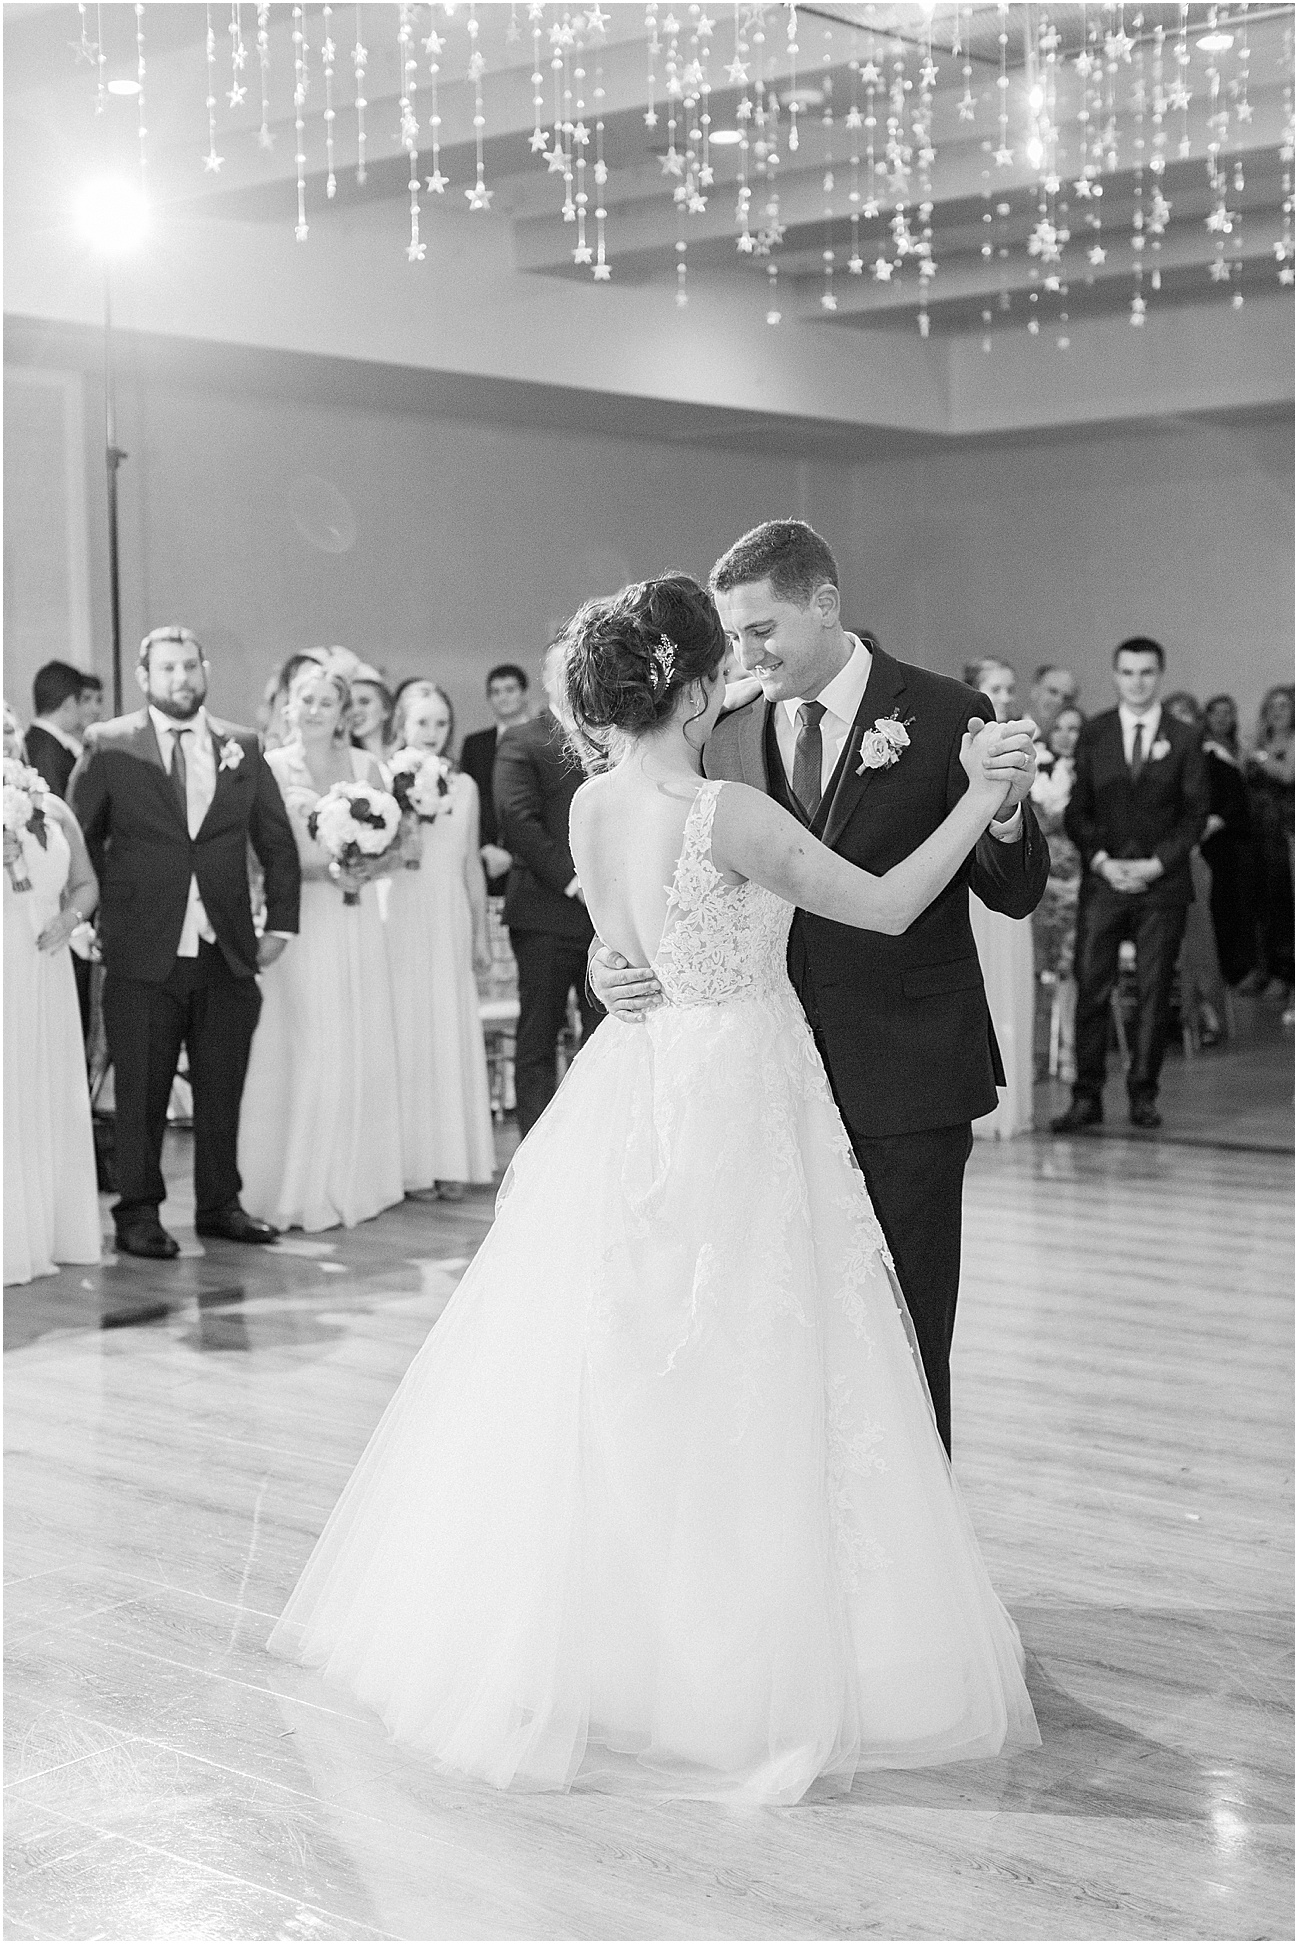 shannon_daniel_dan_atlantic_resort_saint_marys_st_mary_church_fall_newport_catholic_irish_cape_cod_boston_wedding_photographer_meredith_jane_photography_photo_1650.jpg